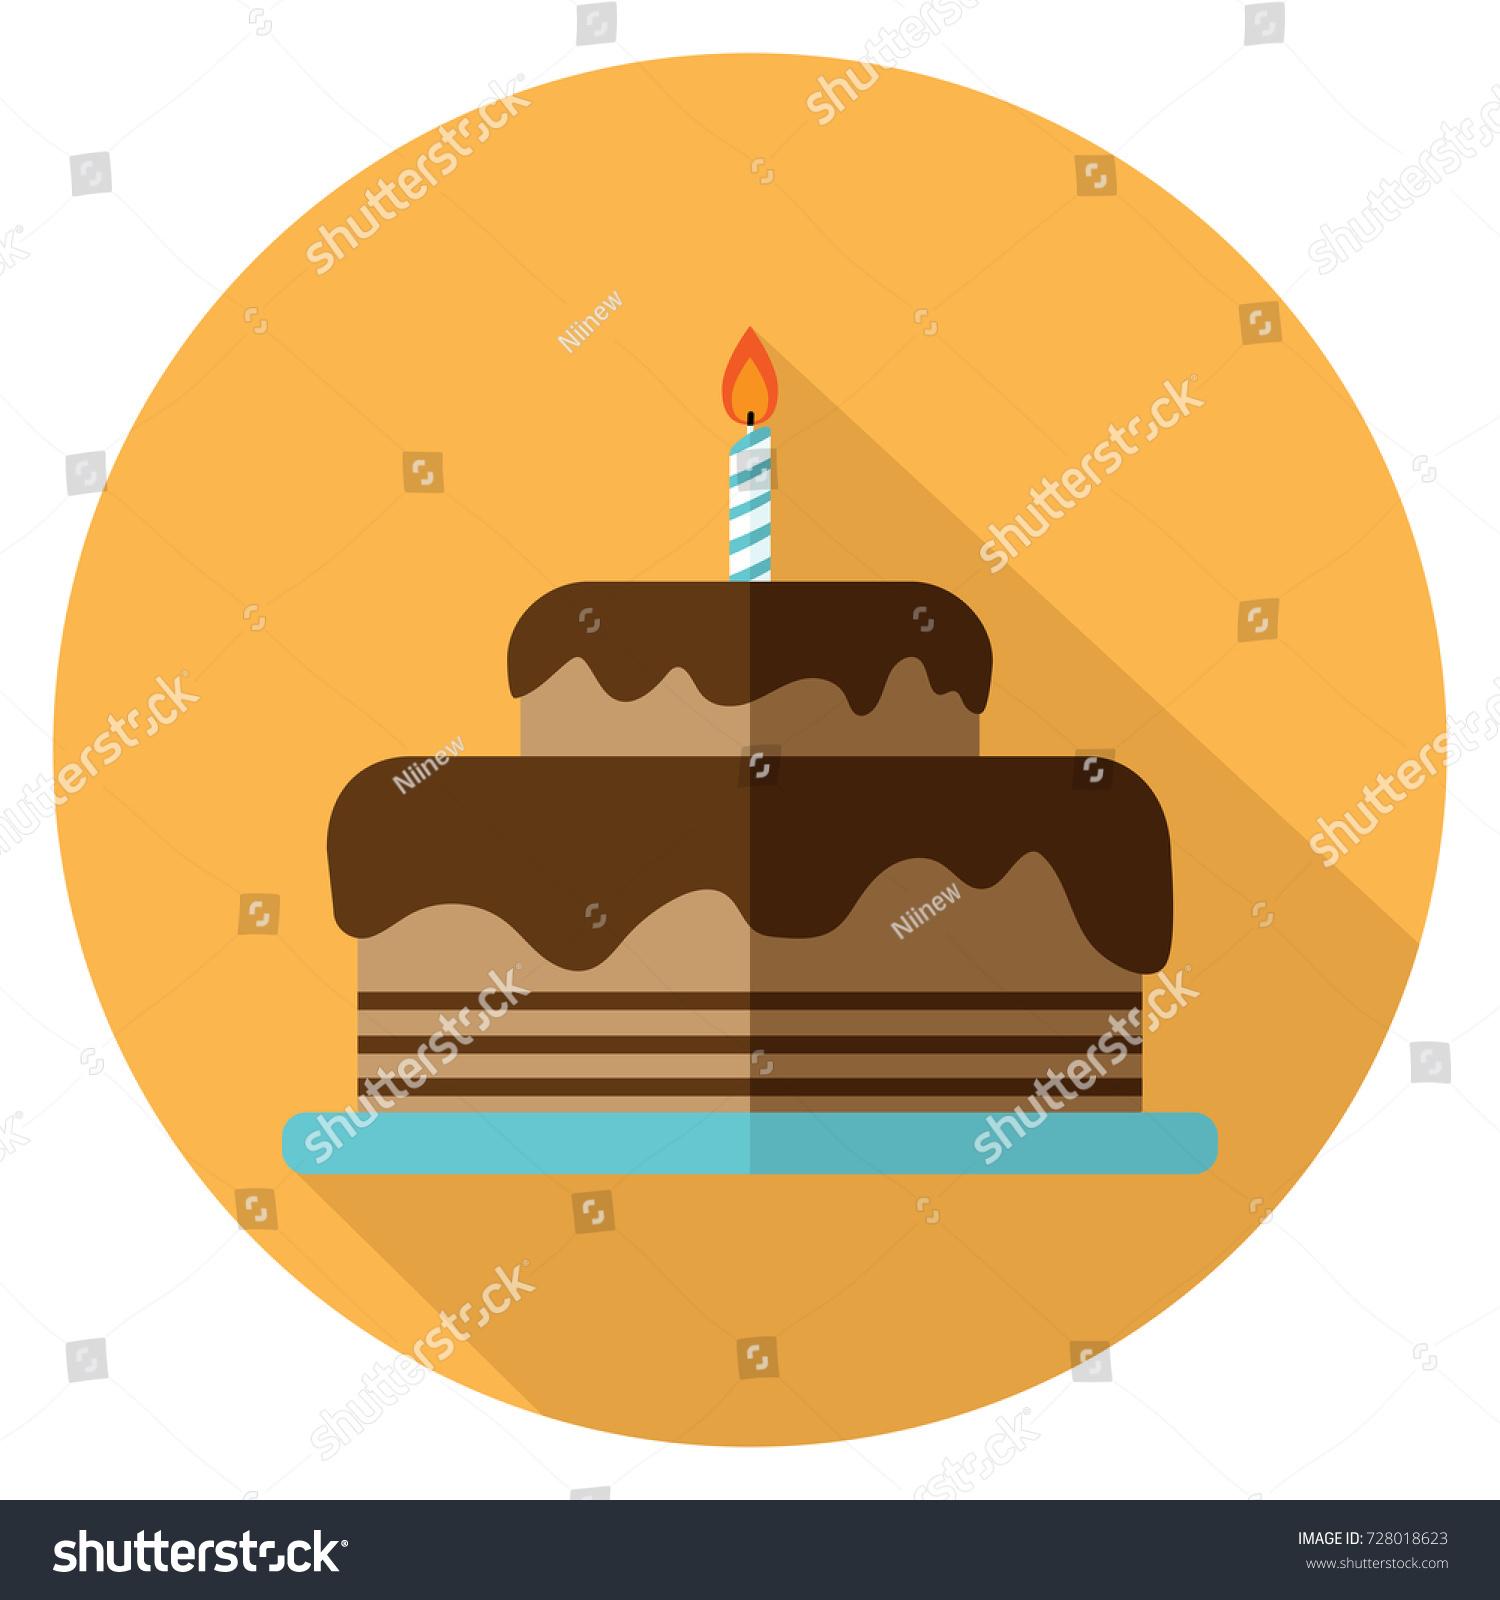 Vector Illustration Chocolate Birthday Cake Icon Stock Vector